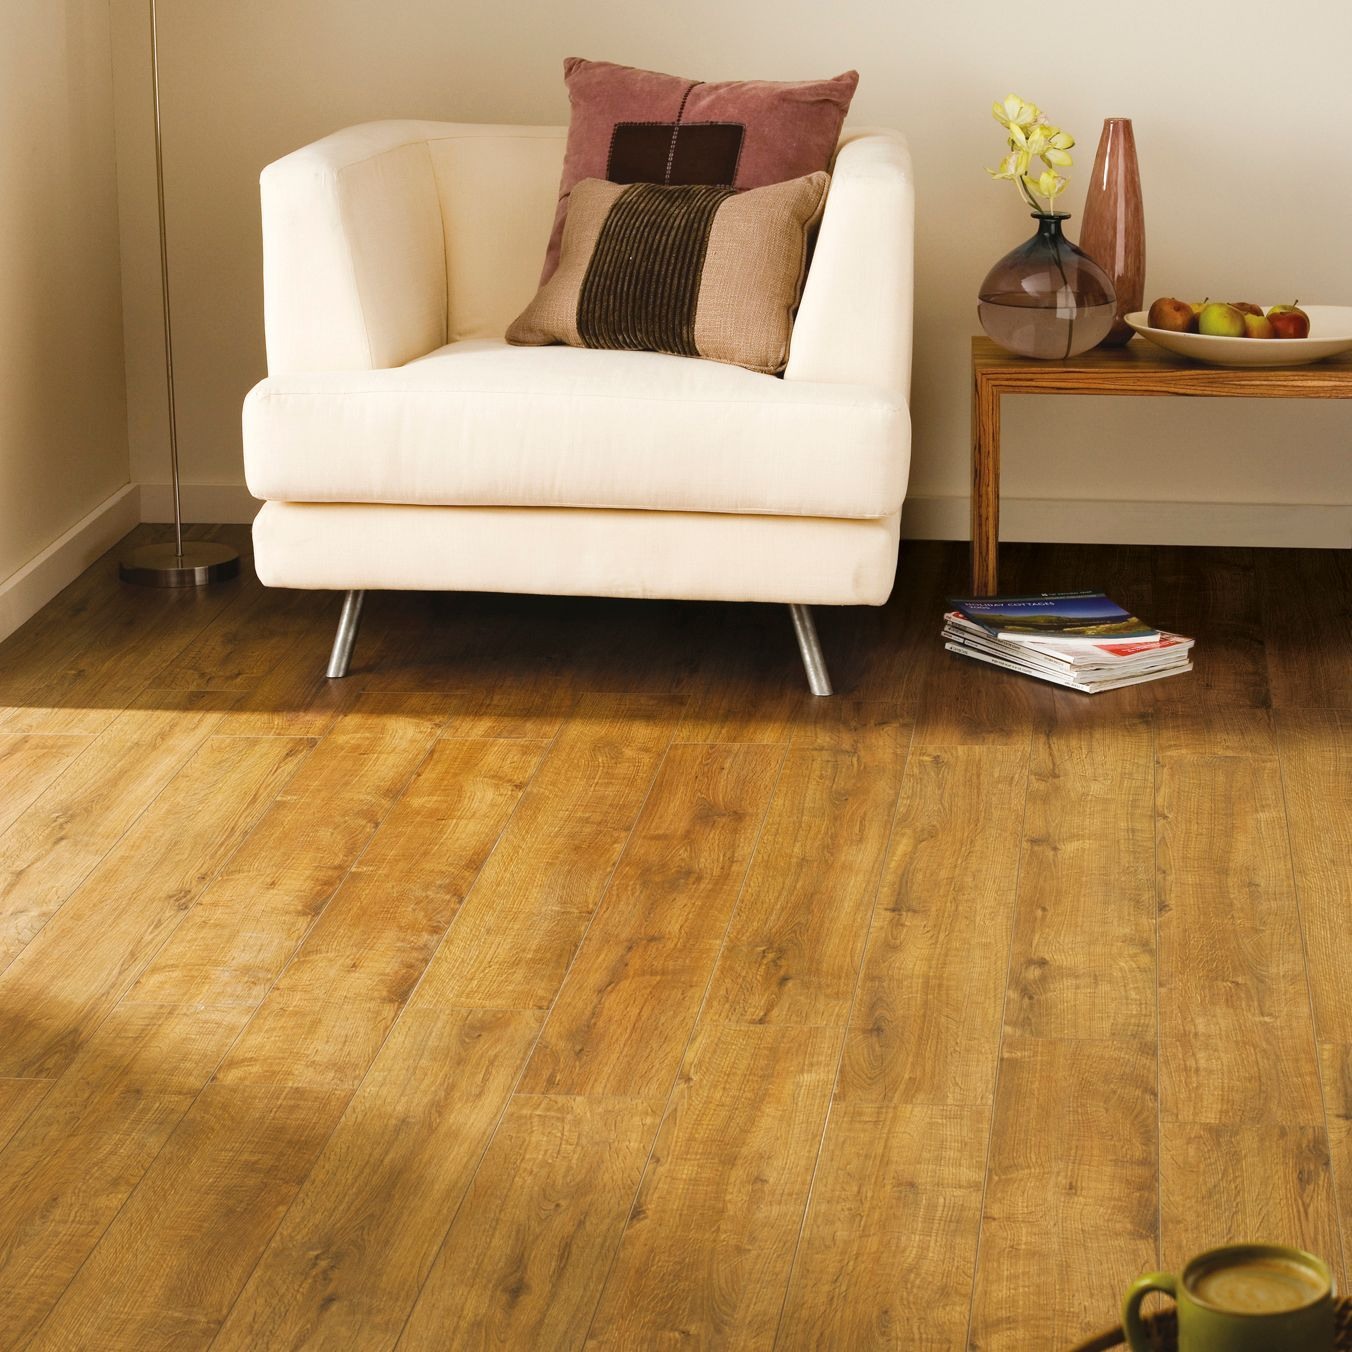 Concertino Kolberg Oak Effect Laminate Flooring 1 48 M² Pack